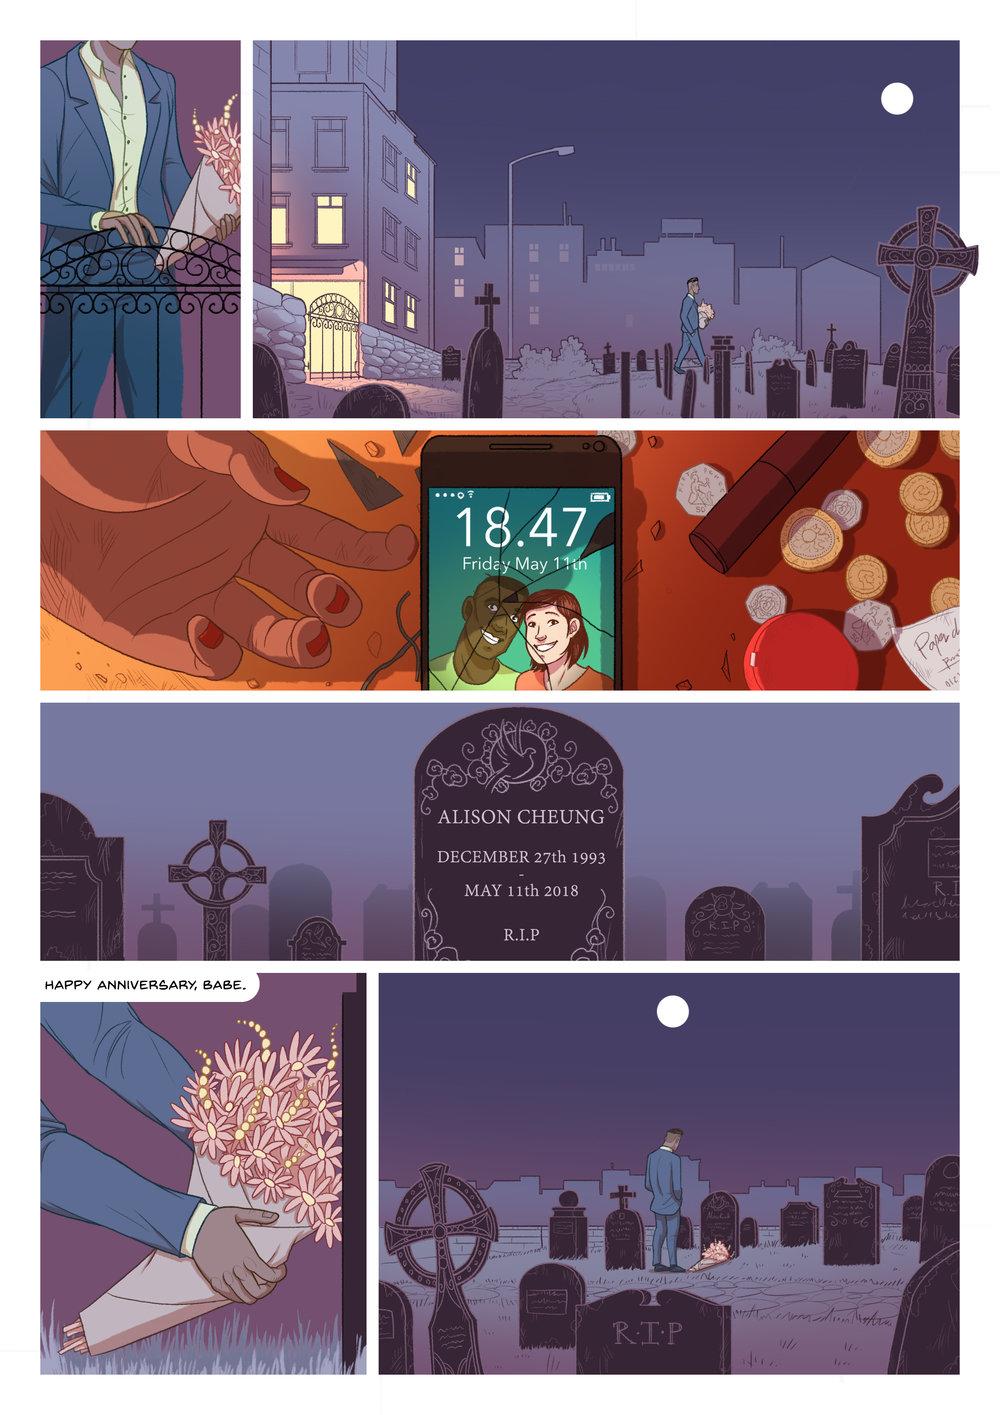 Anniversary page 5.jpg